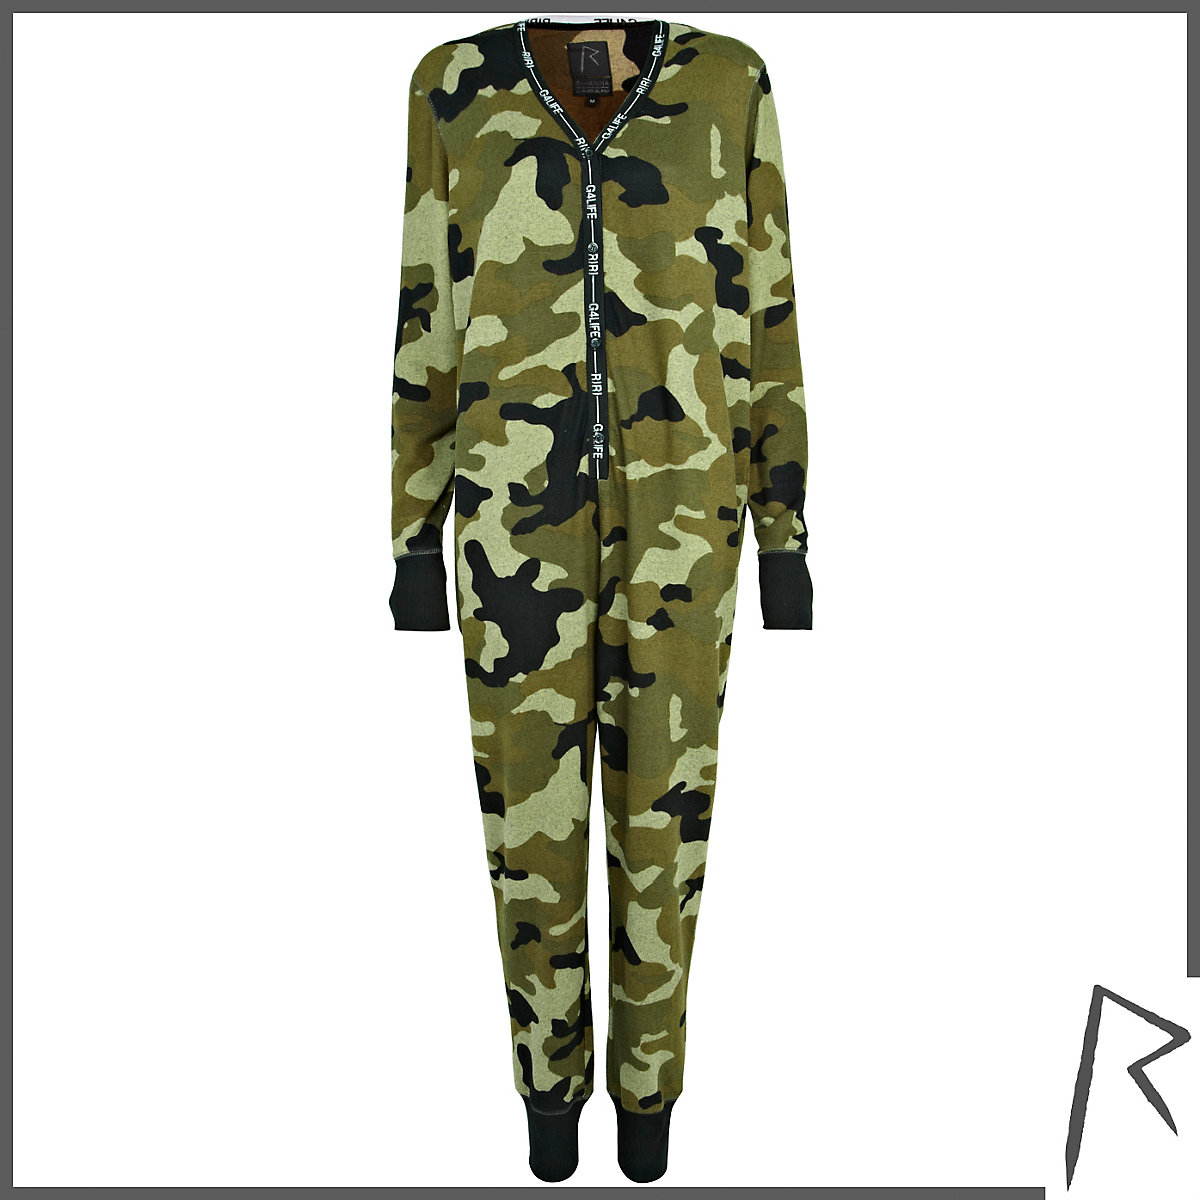 Khaki Rihanna camo all-in-one